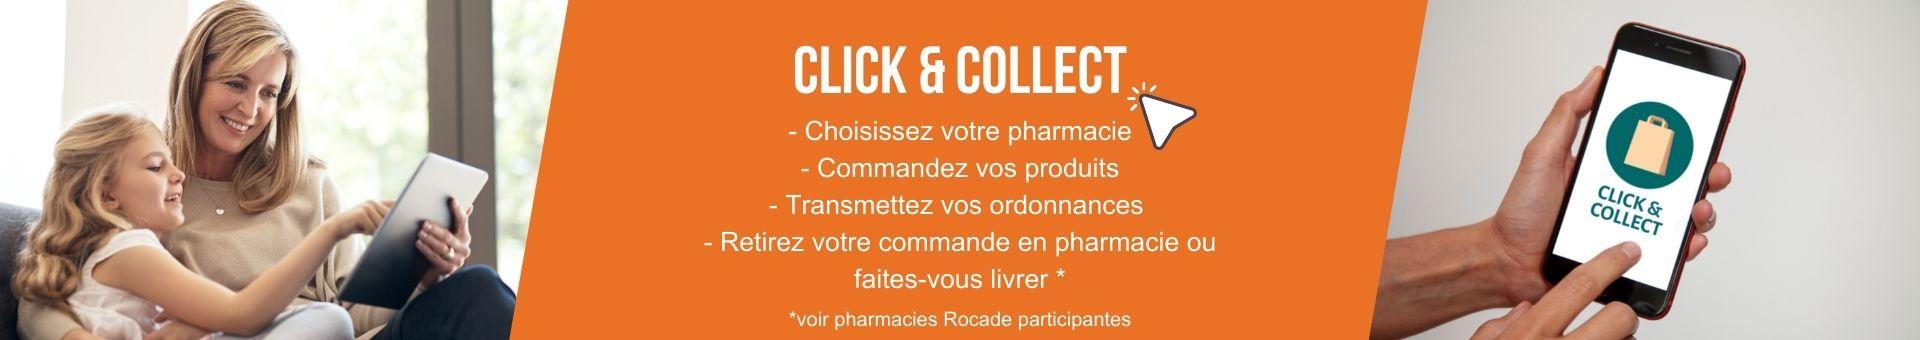 Pharmacie du Forum,TALENCE